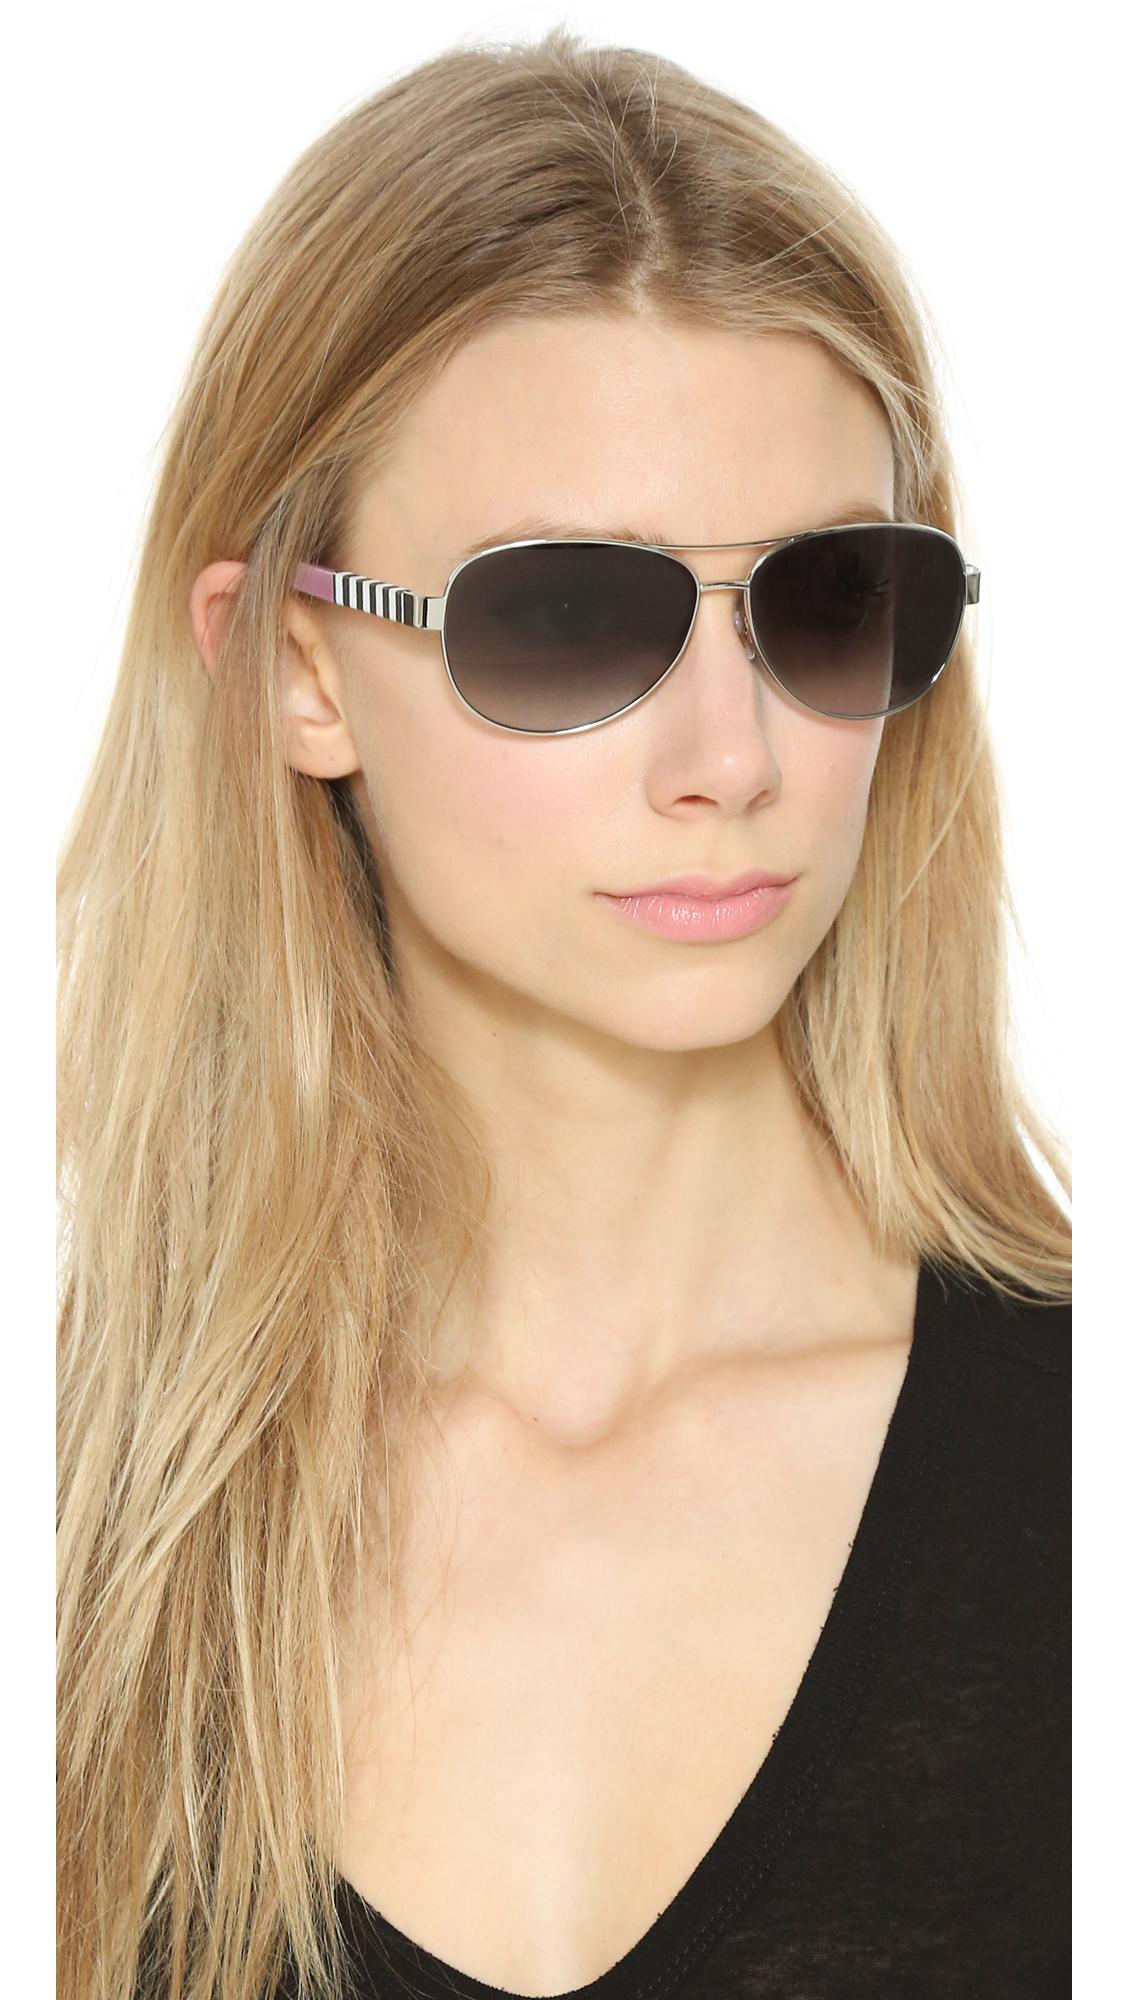 25a60cbdb2f6 Kate Spade Dalia Sunglasses - Silver/grey Gradient in Metallic - Lyst